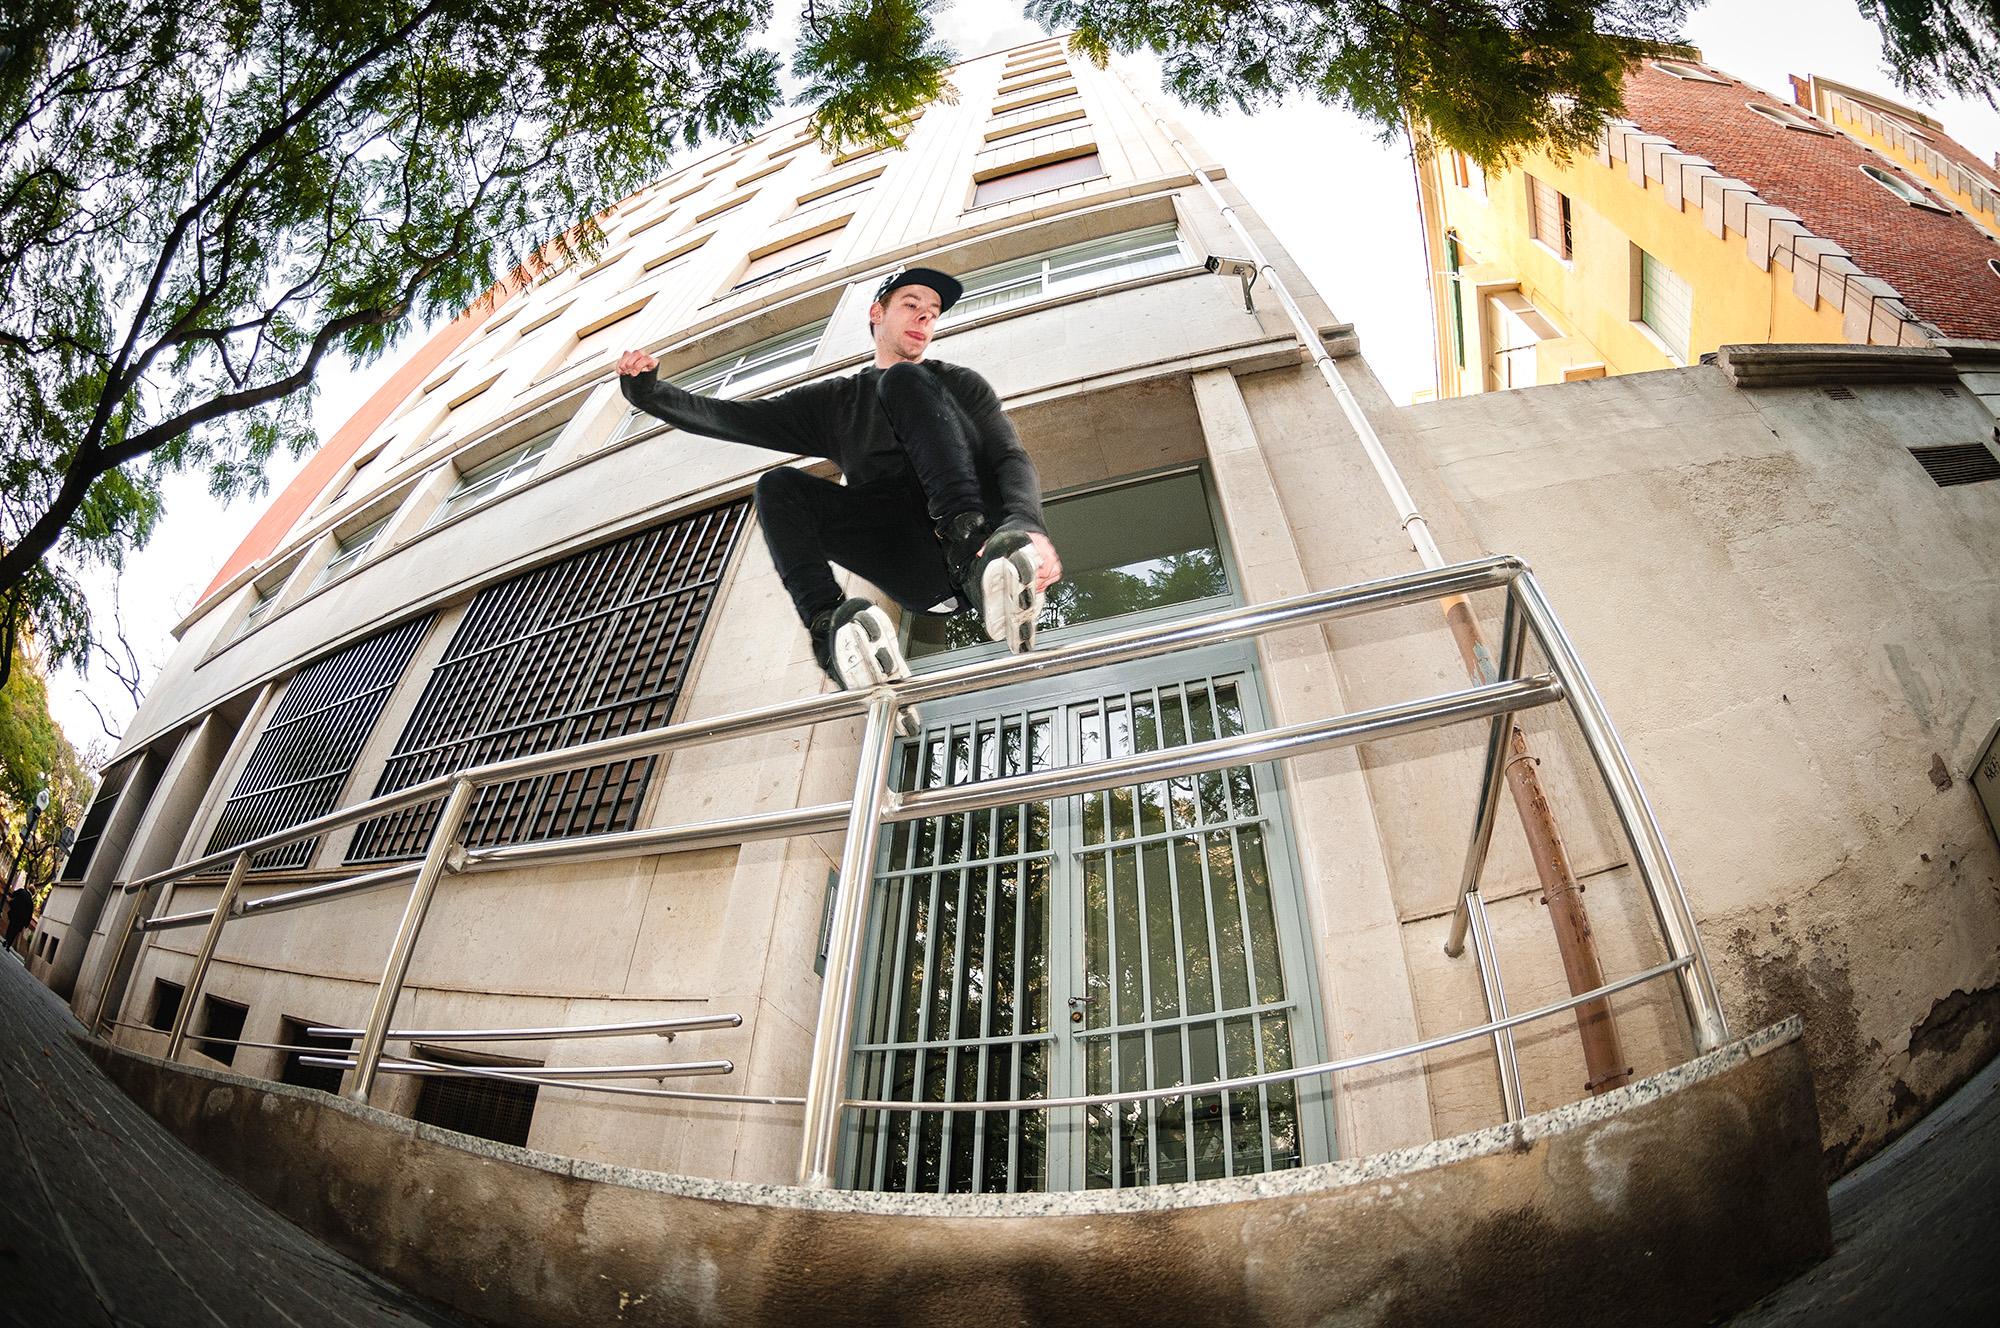 sem backslide - Skateboard Deckbank